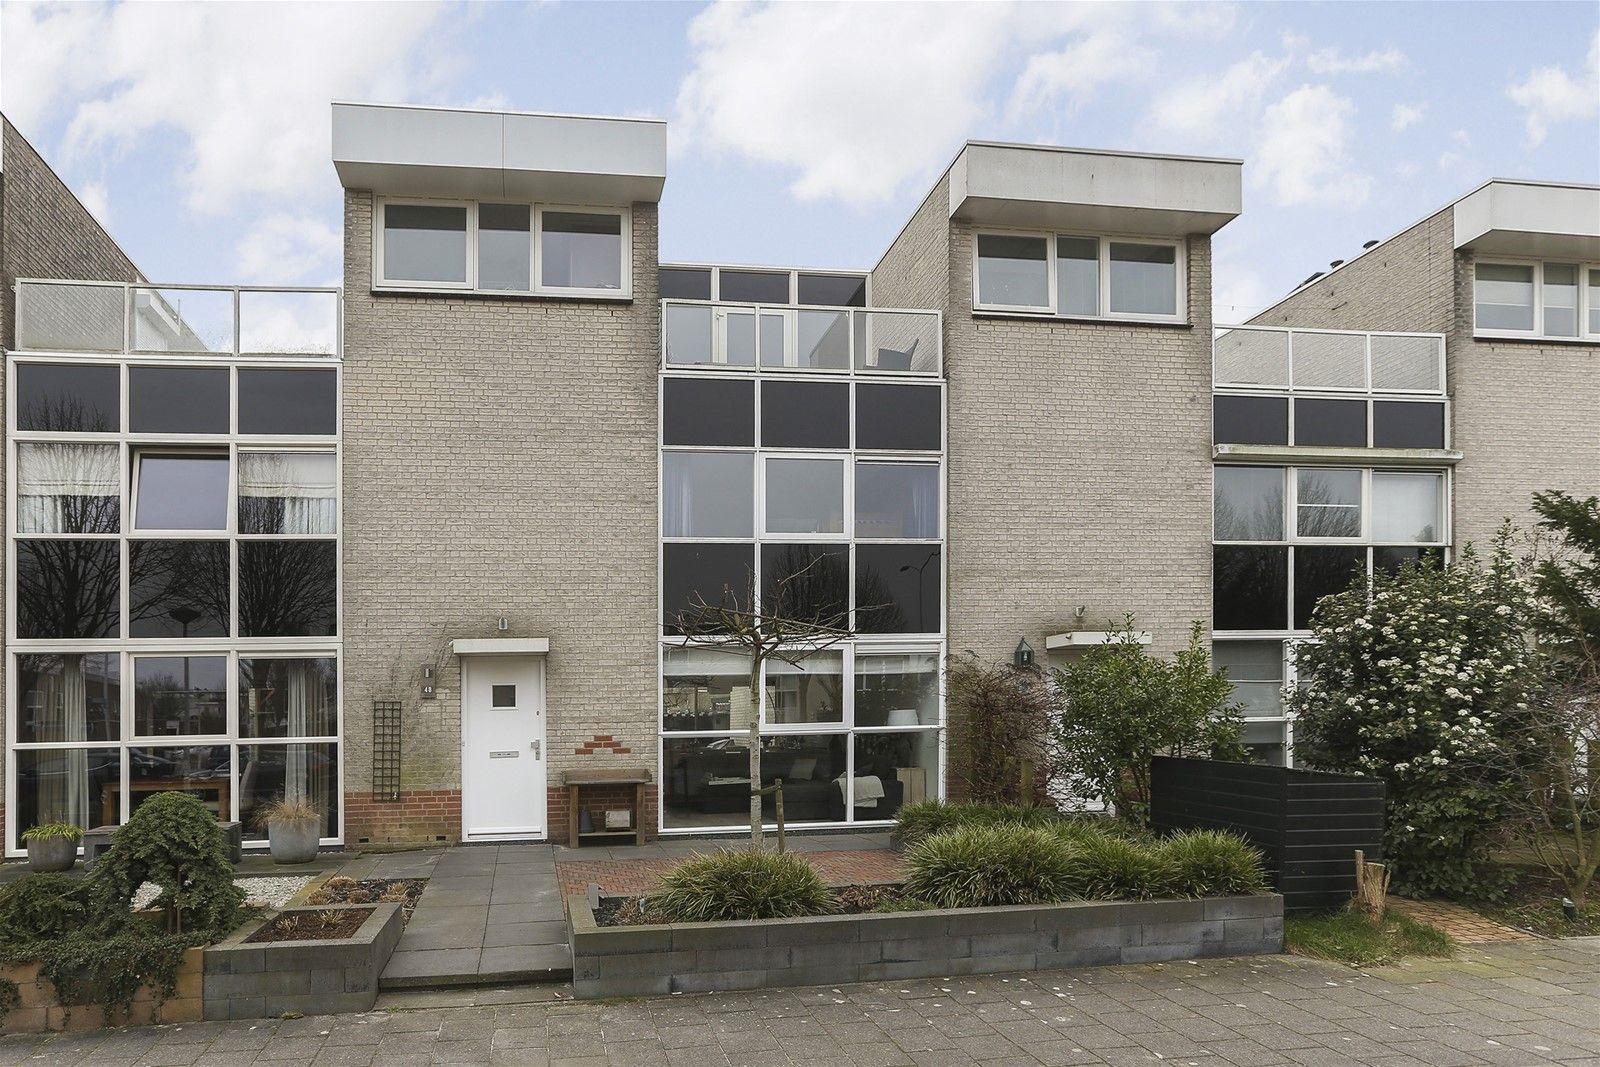 Westkil 48, Papendrecht